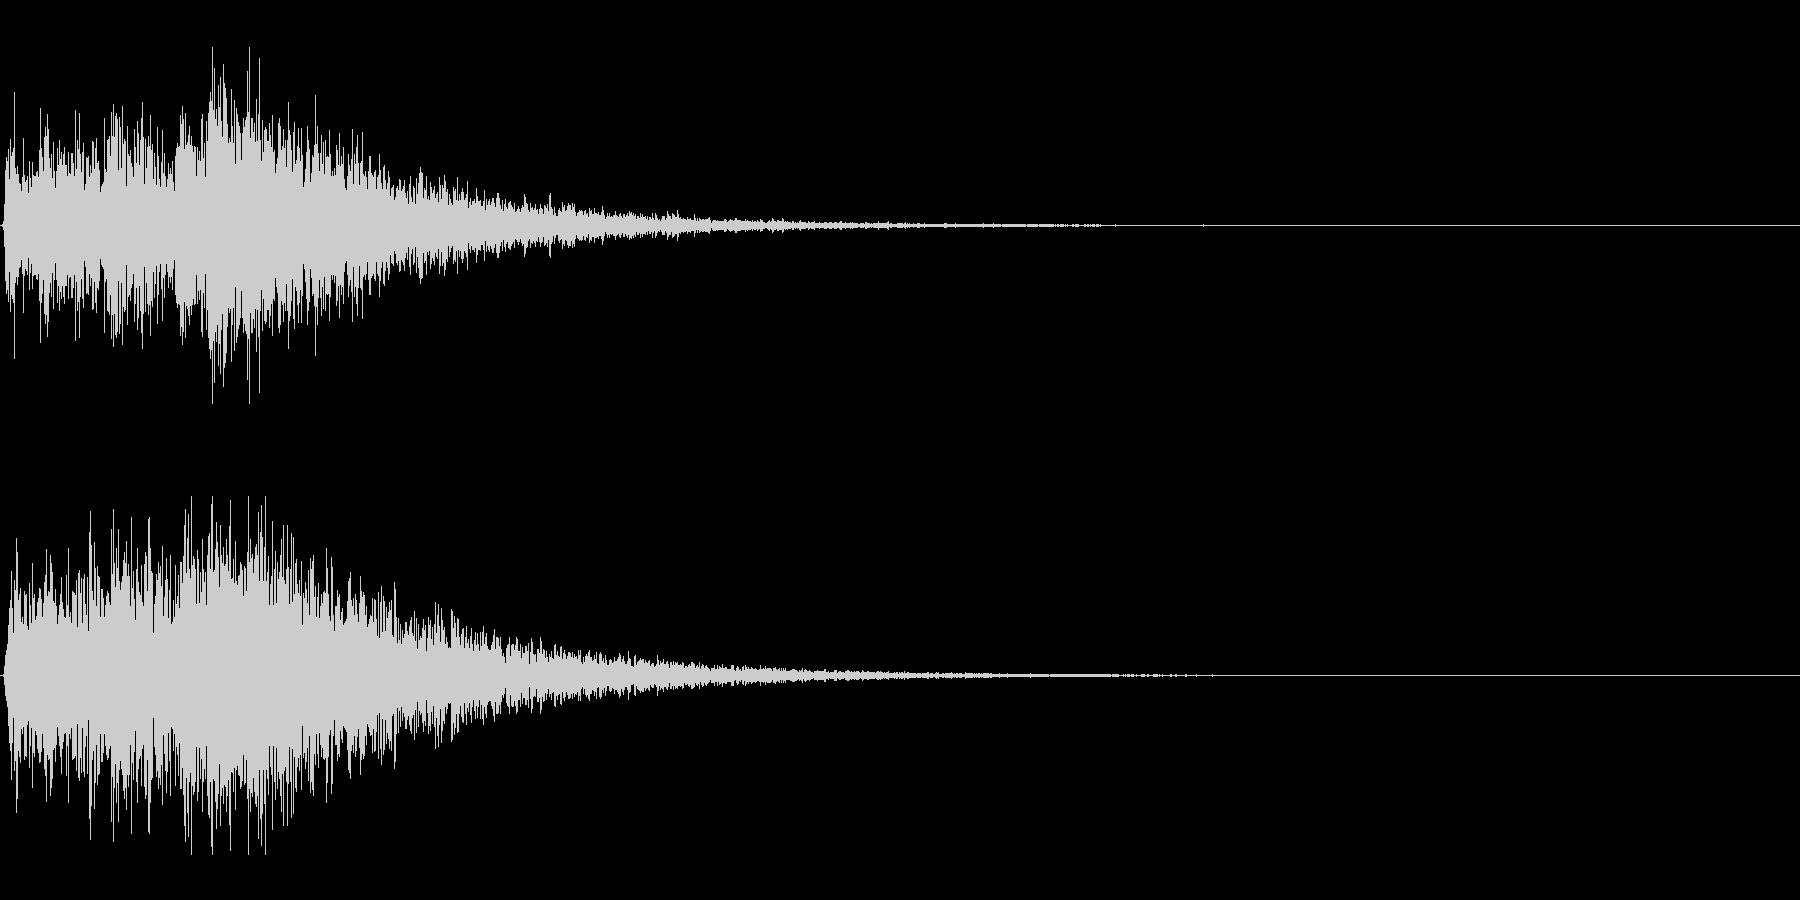 Dark_Attack-32_Delayの未再生の波形